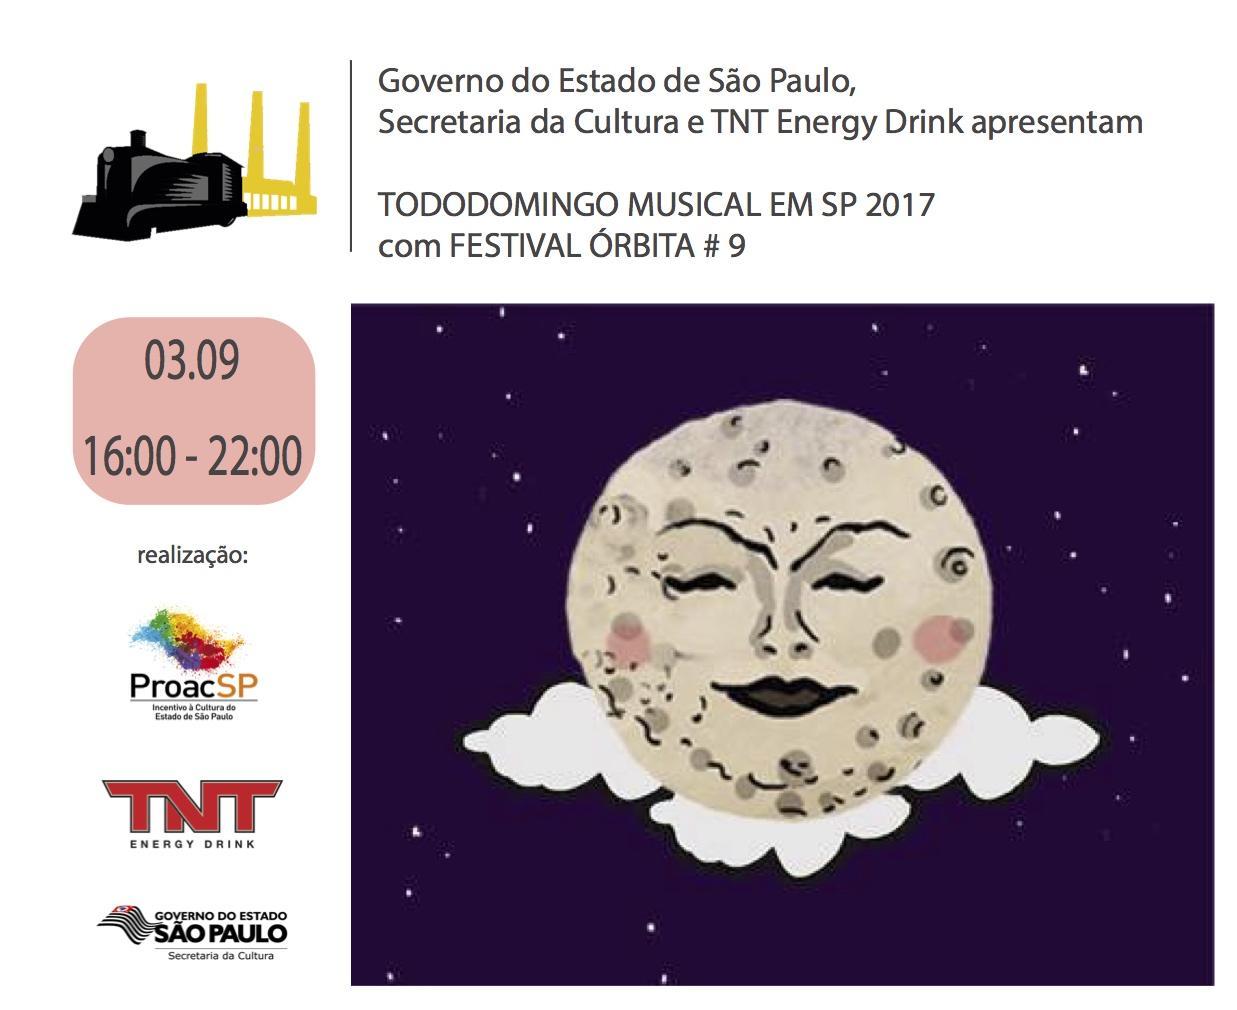 Festival ÓRBITA #9